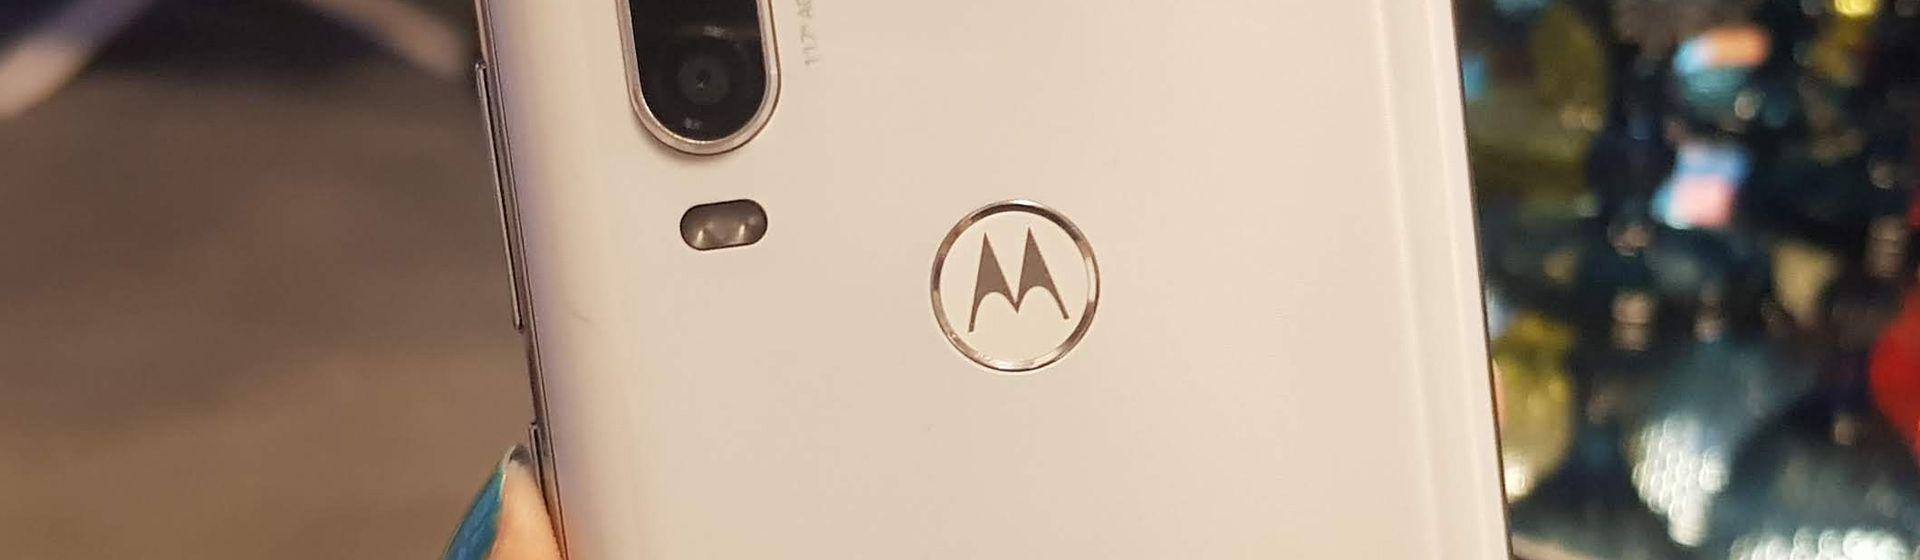 Motorola One Fusion+: veja os primeiros rumores sobre ficha técnica